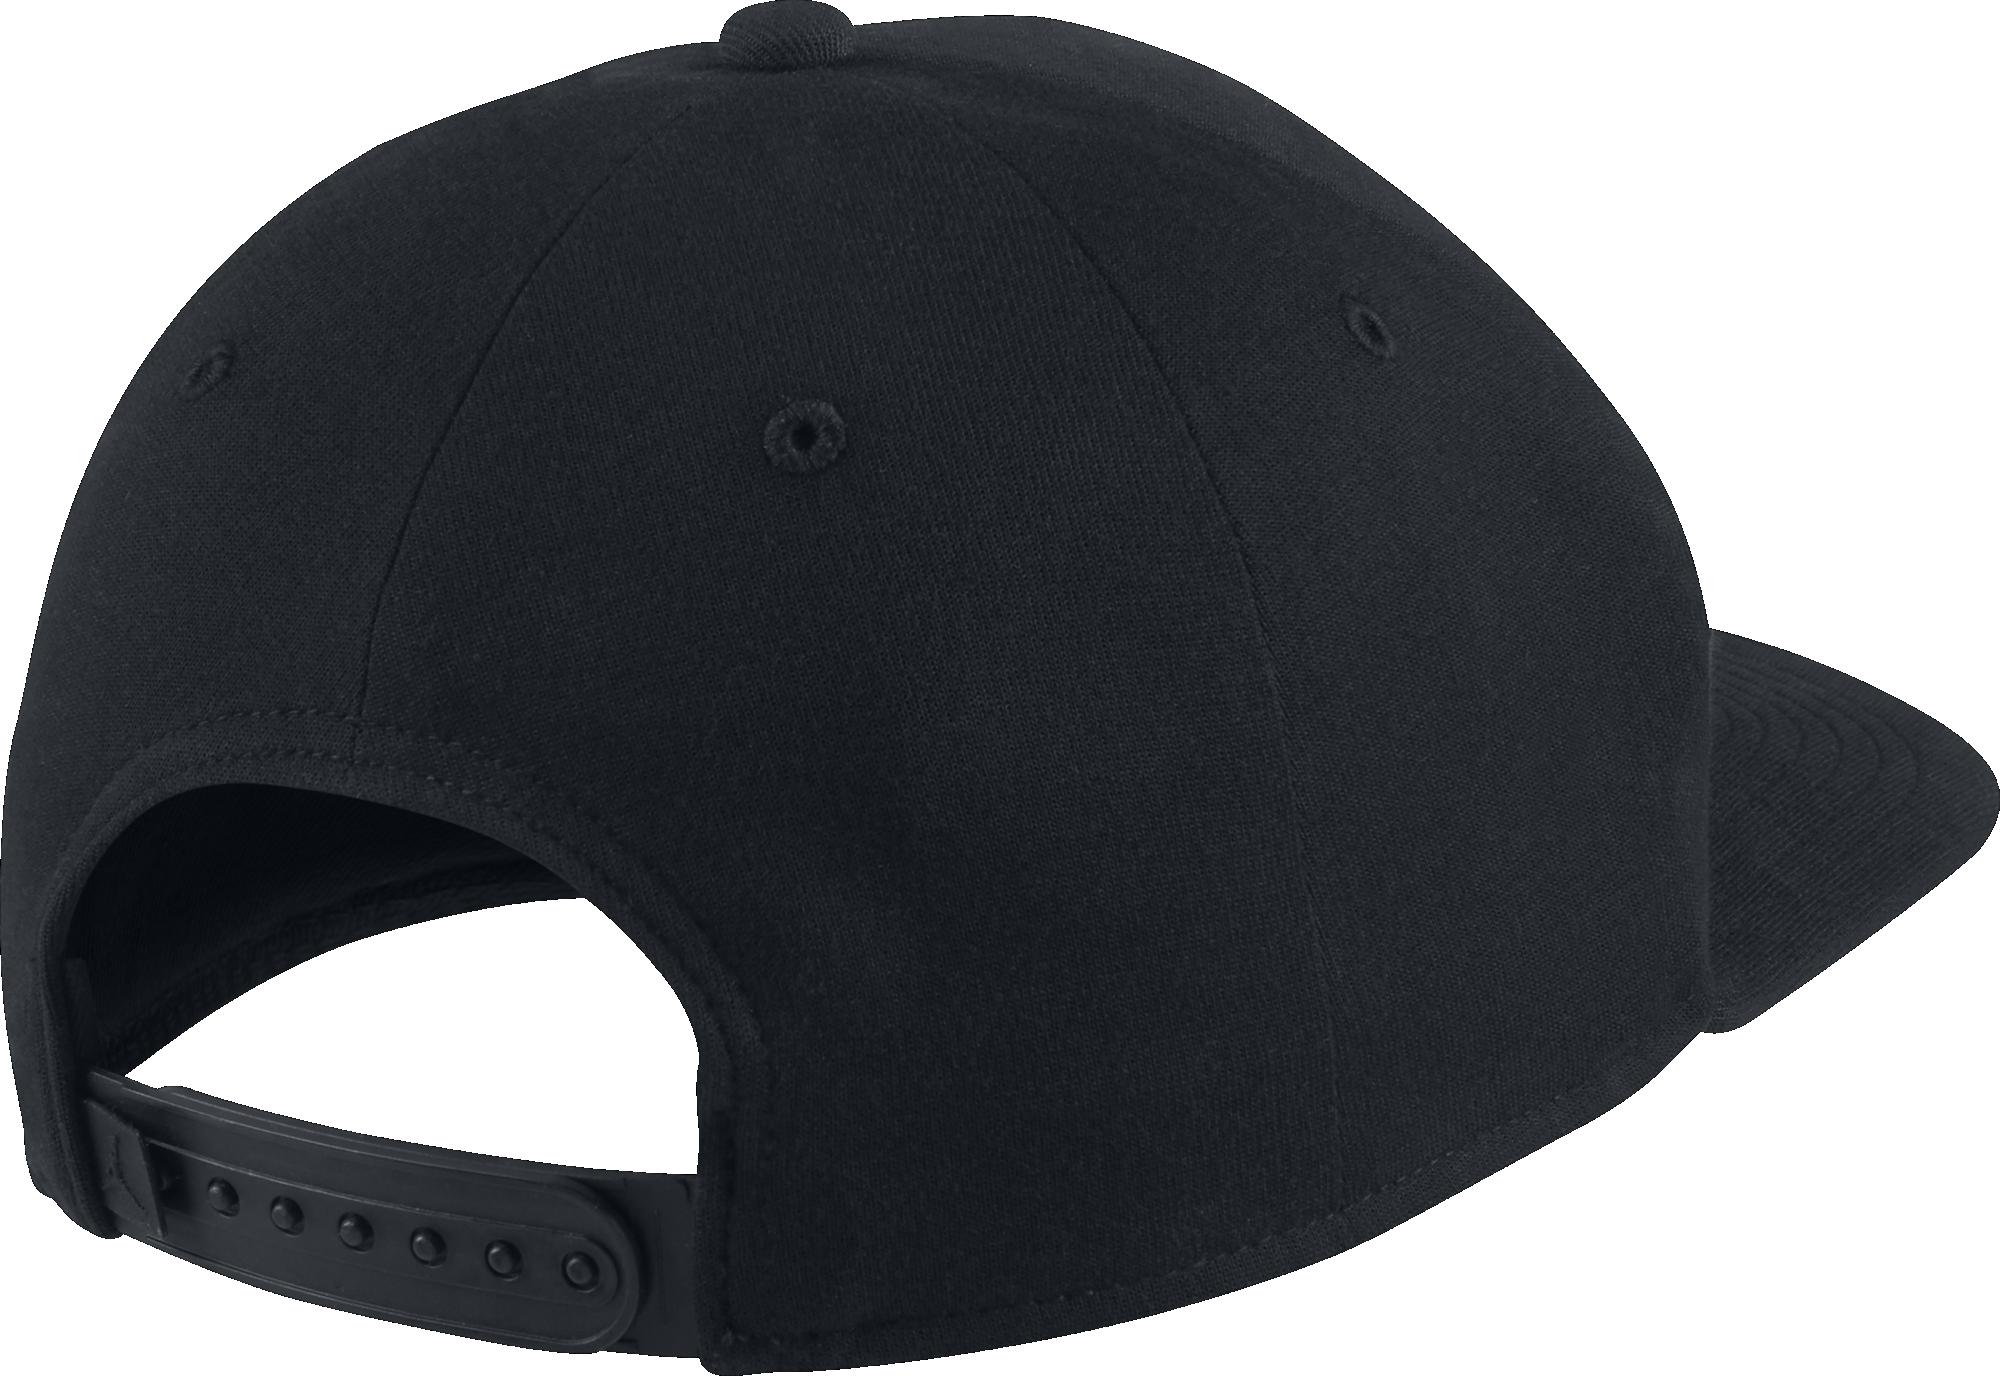 NIKE AIR JORDAN 23 LUX SNAPBACK HAT for £30.00  721f90f89a6